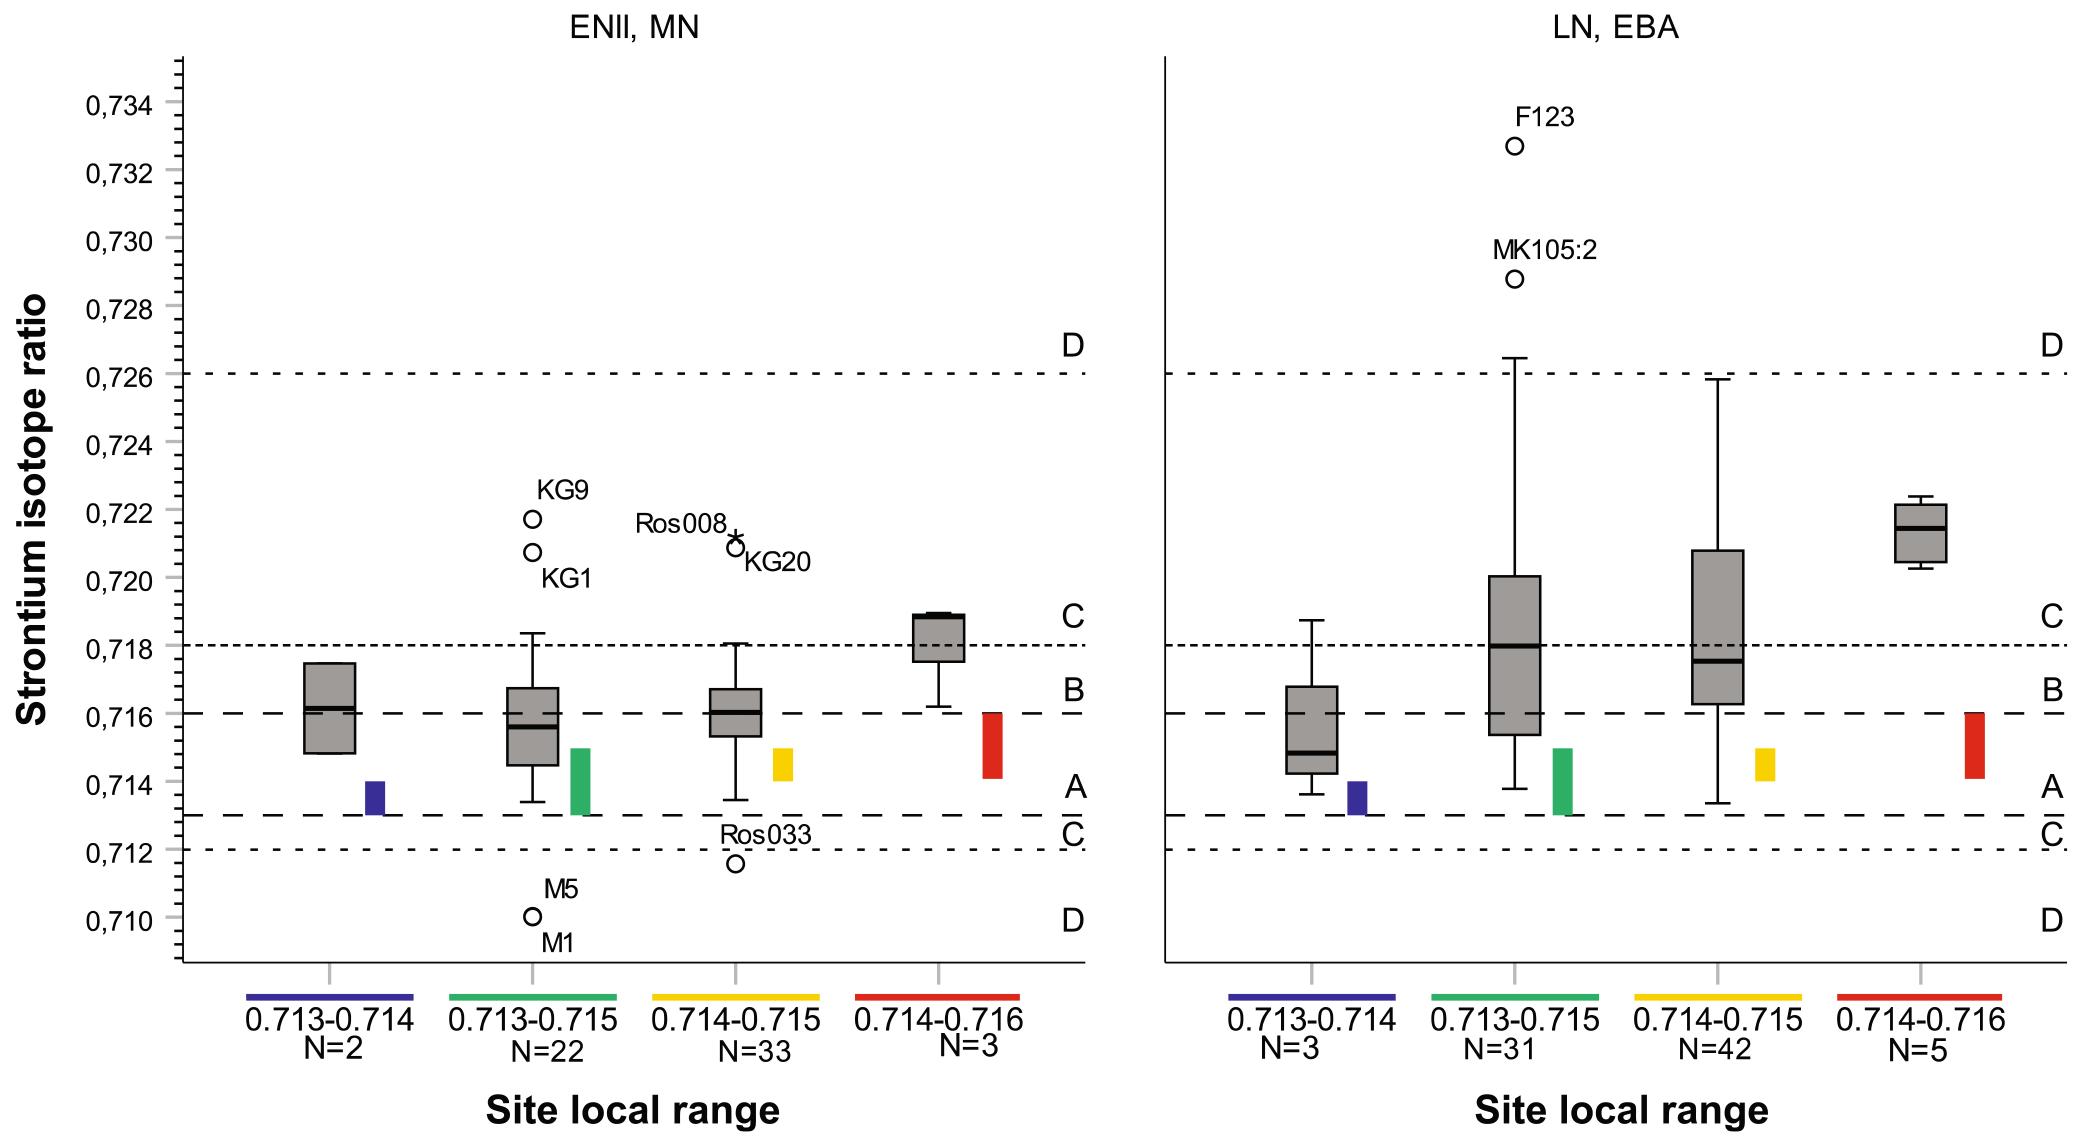 isotope-ratio-sites-vastergotland